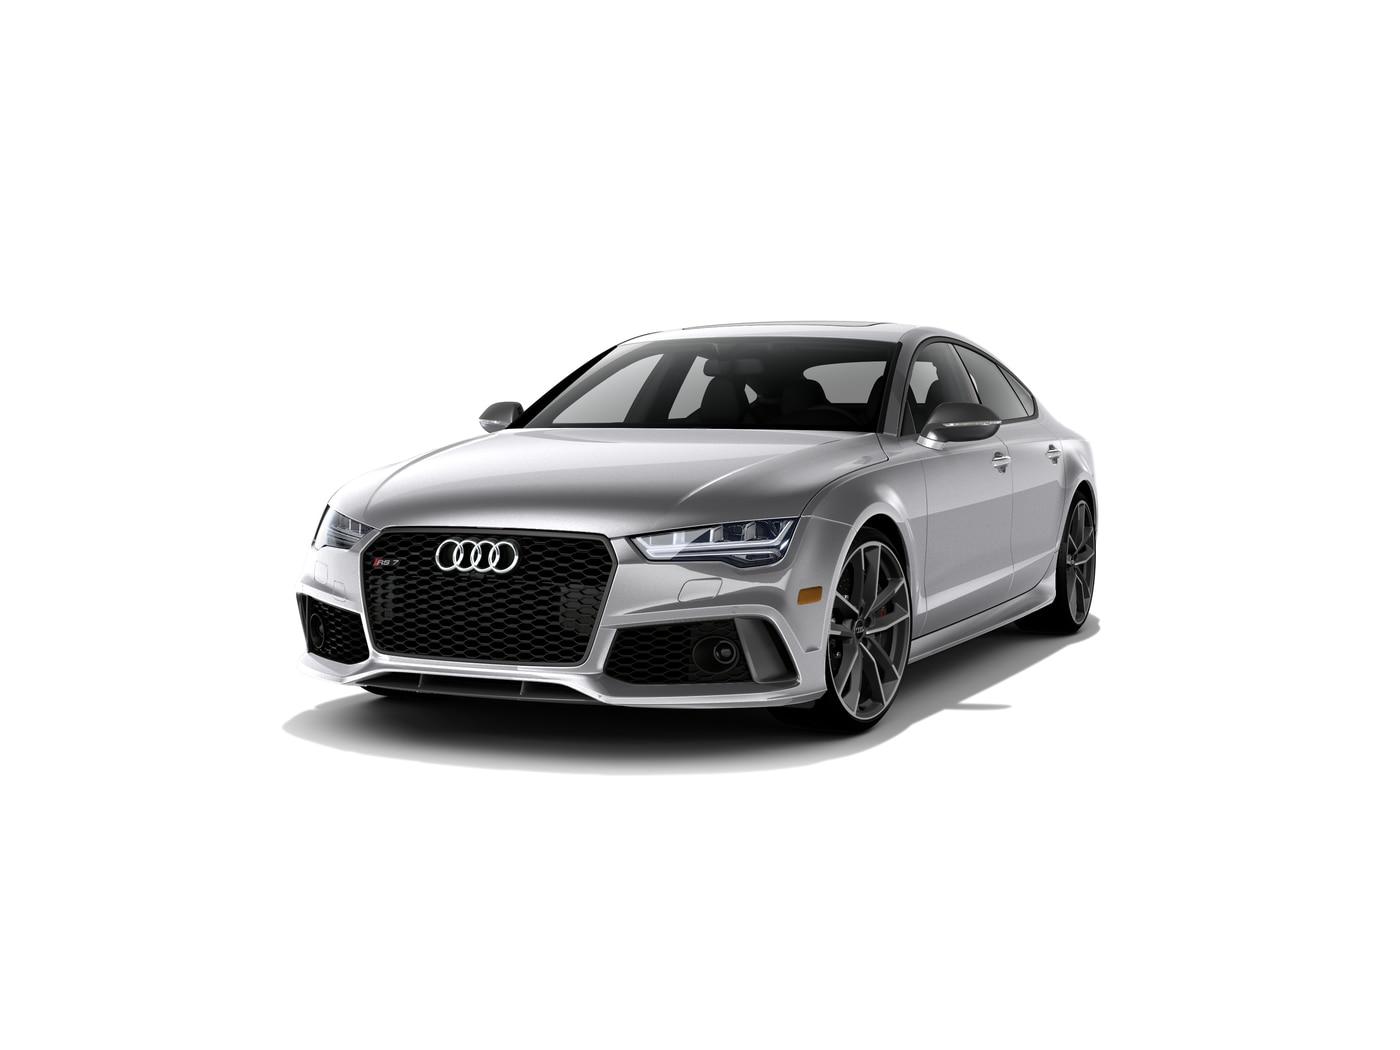 2018 Audi RS 7 4.0T performance Hatchback